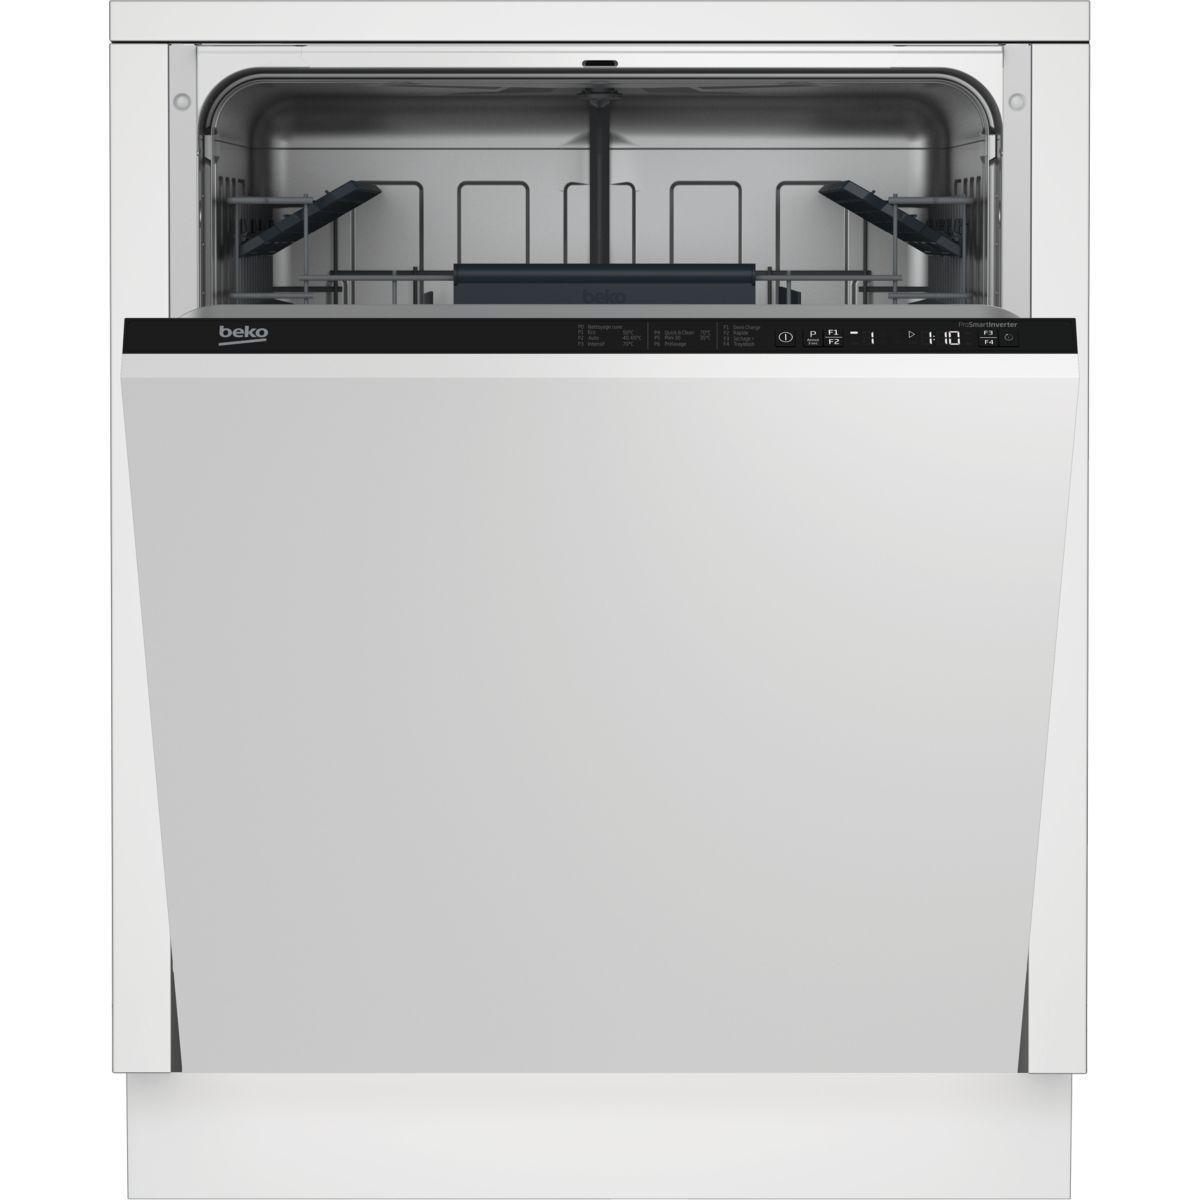 lave vaisselle encastrable bandeau inox free intgrable beko dsnx a avec bandeau inox with lave. Black Bedroom Furniture Sets. Home Design Ideas